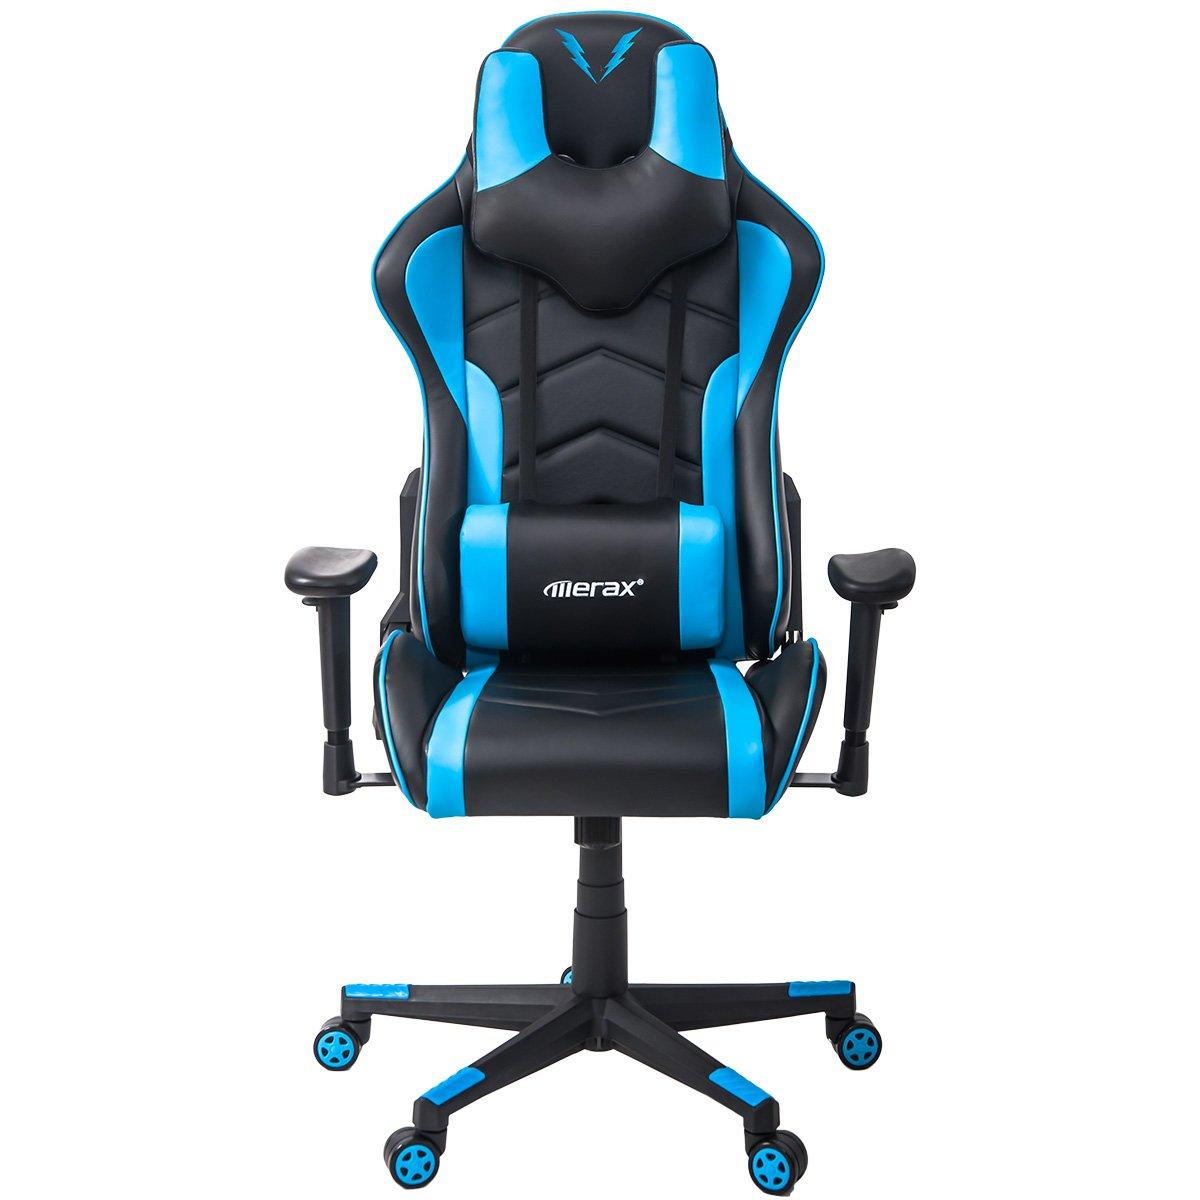 Merax U-Knight Series Racing Style Gaming Chair Ergonomic High Back PU Leather (Blue)